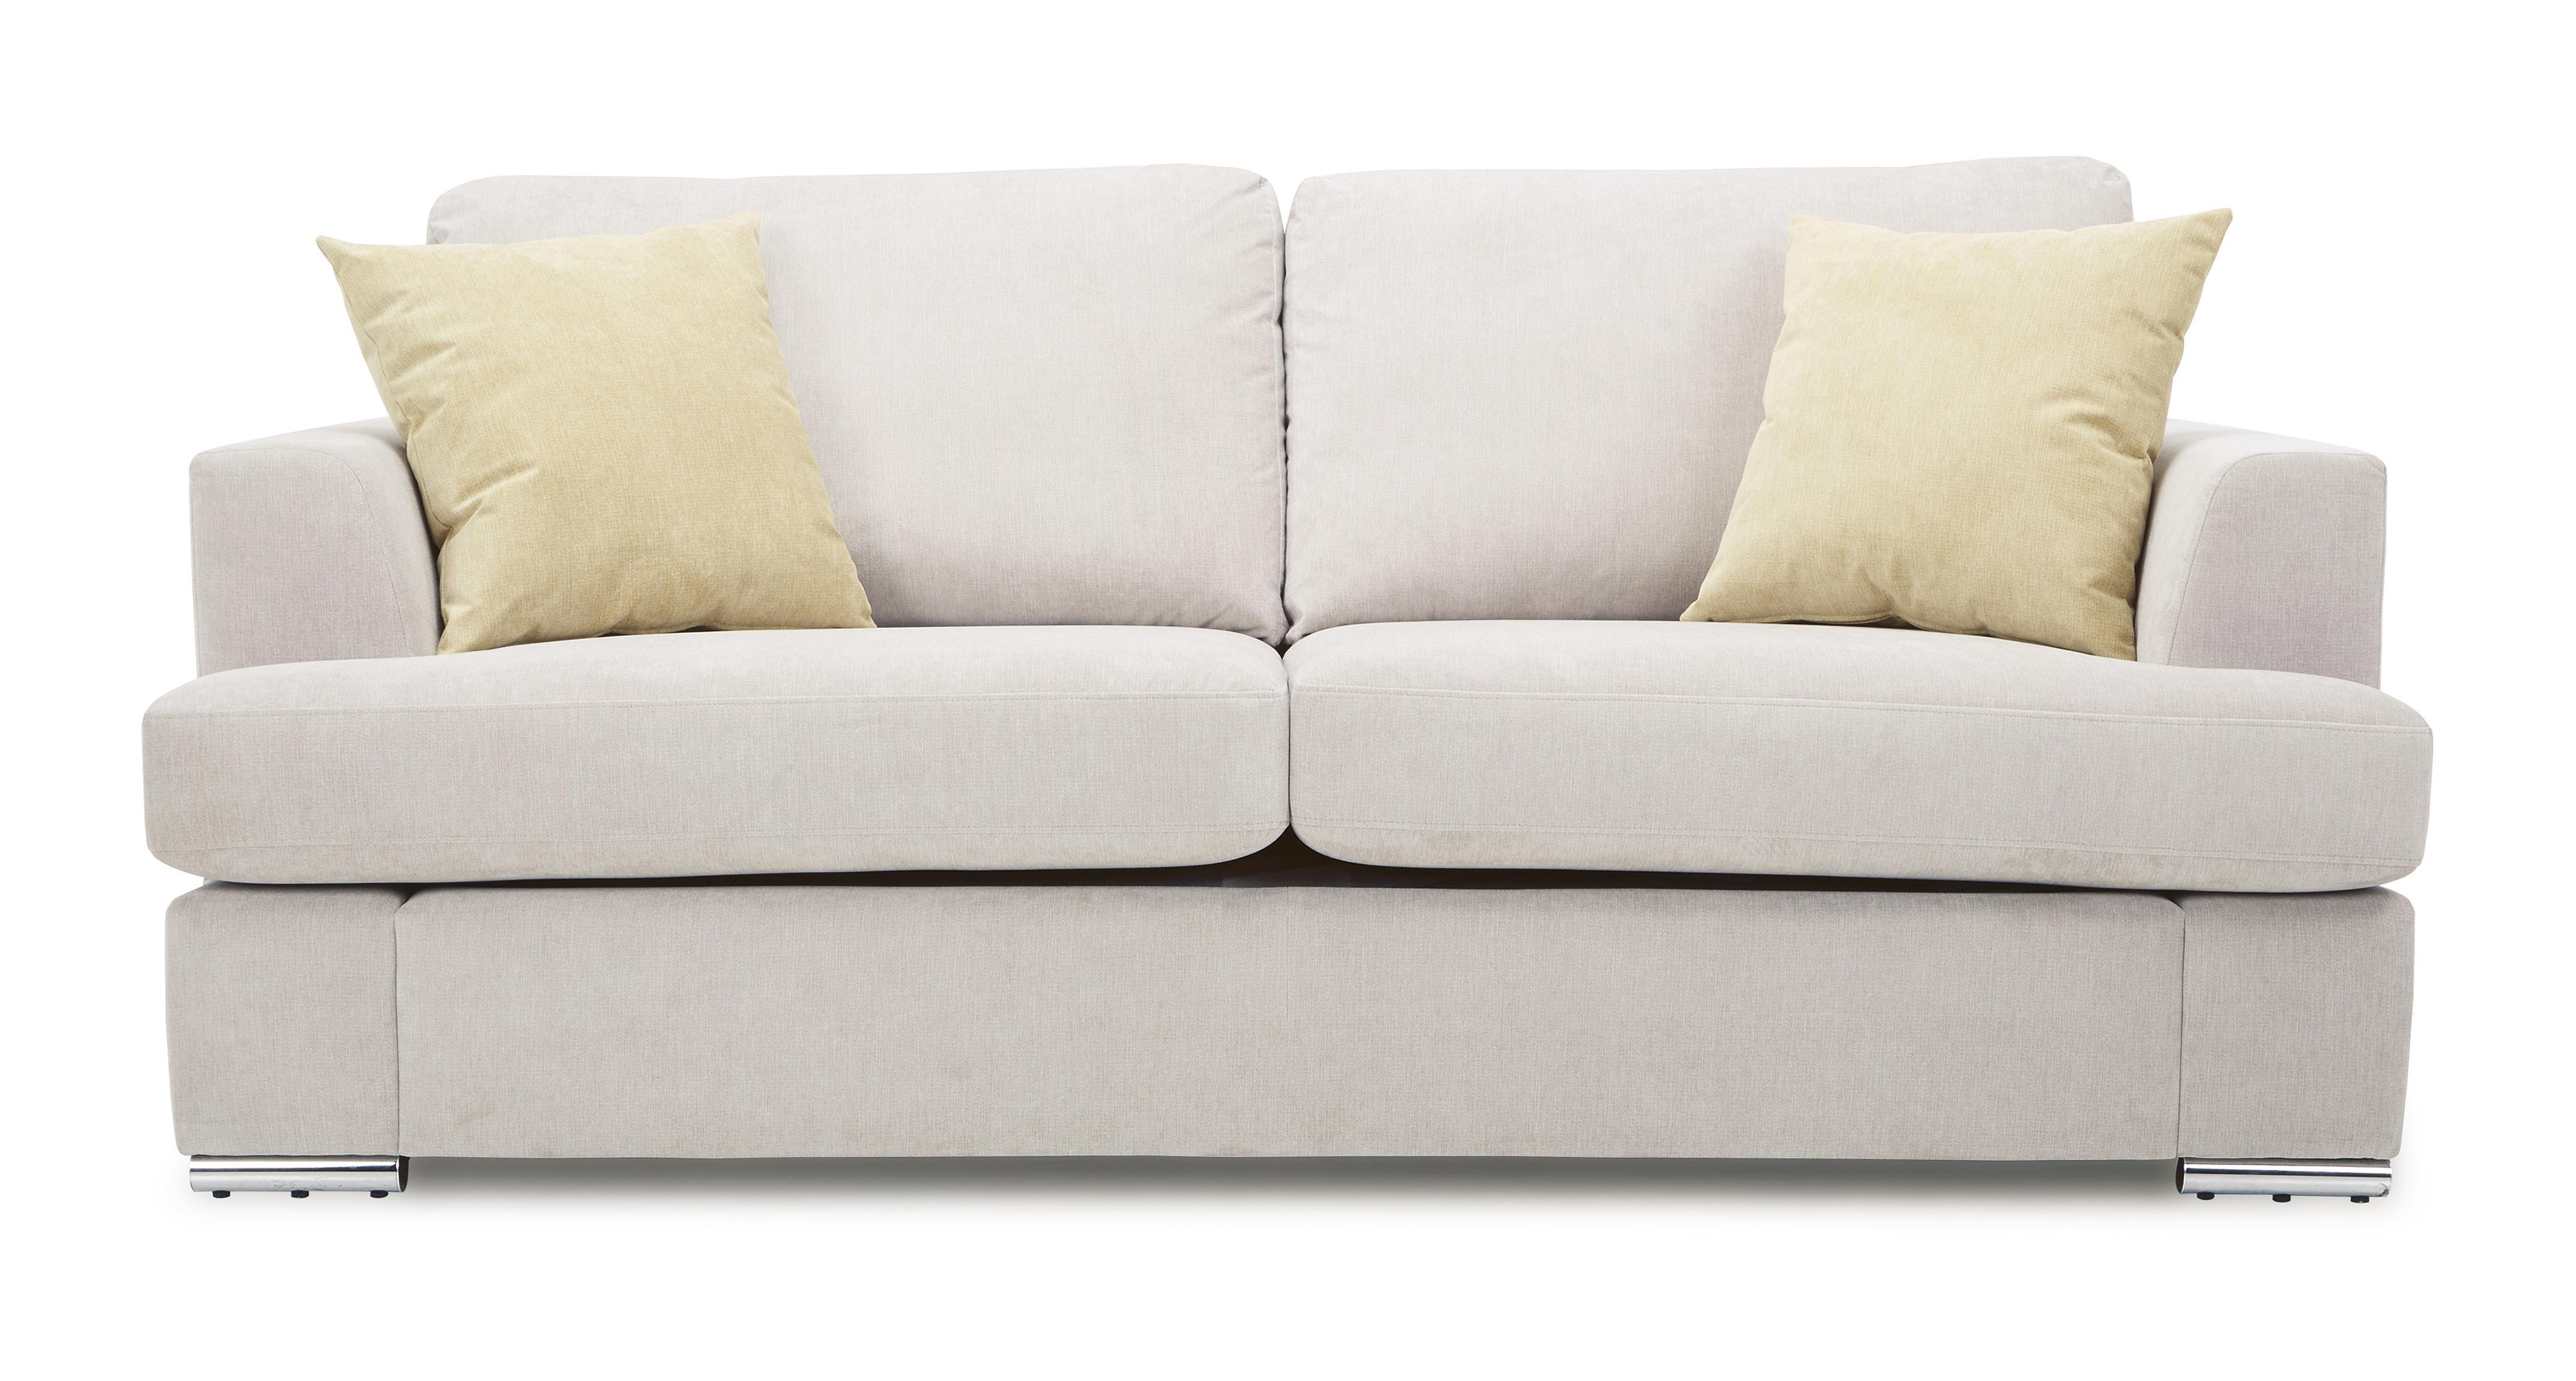 Freya 3 Seater Sofa | DFS